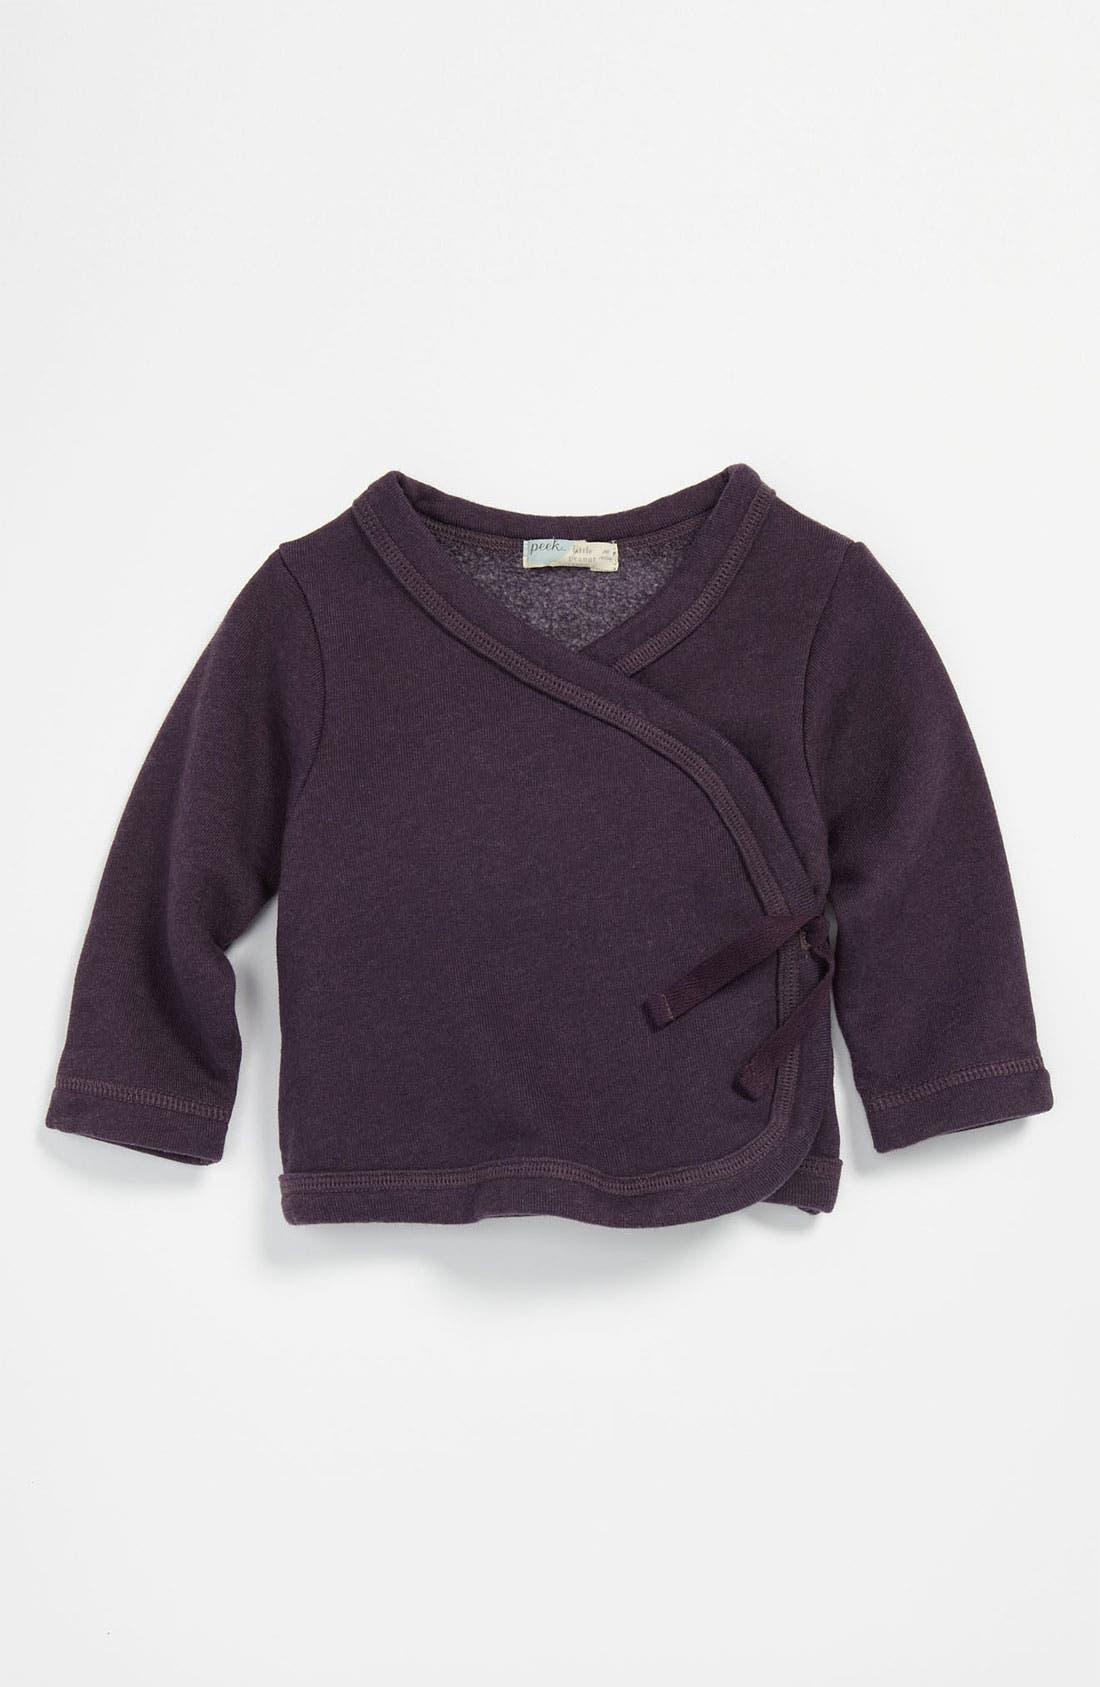 Alternate Image 1 Selected - Peek 'Cozy' Wrap Sweater (Infant)